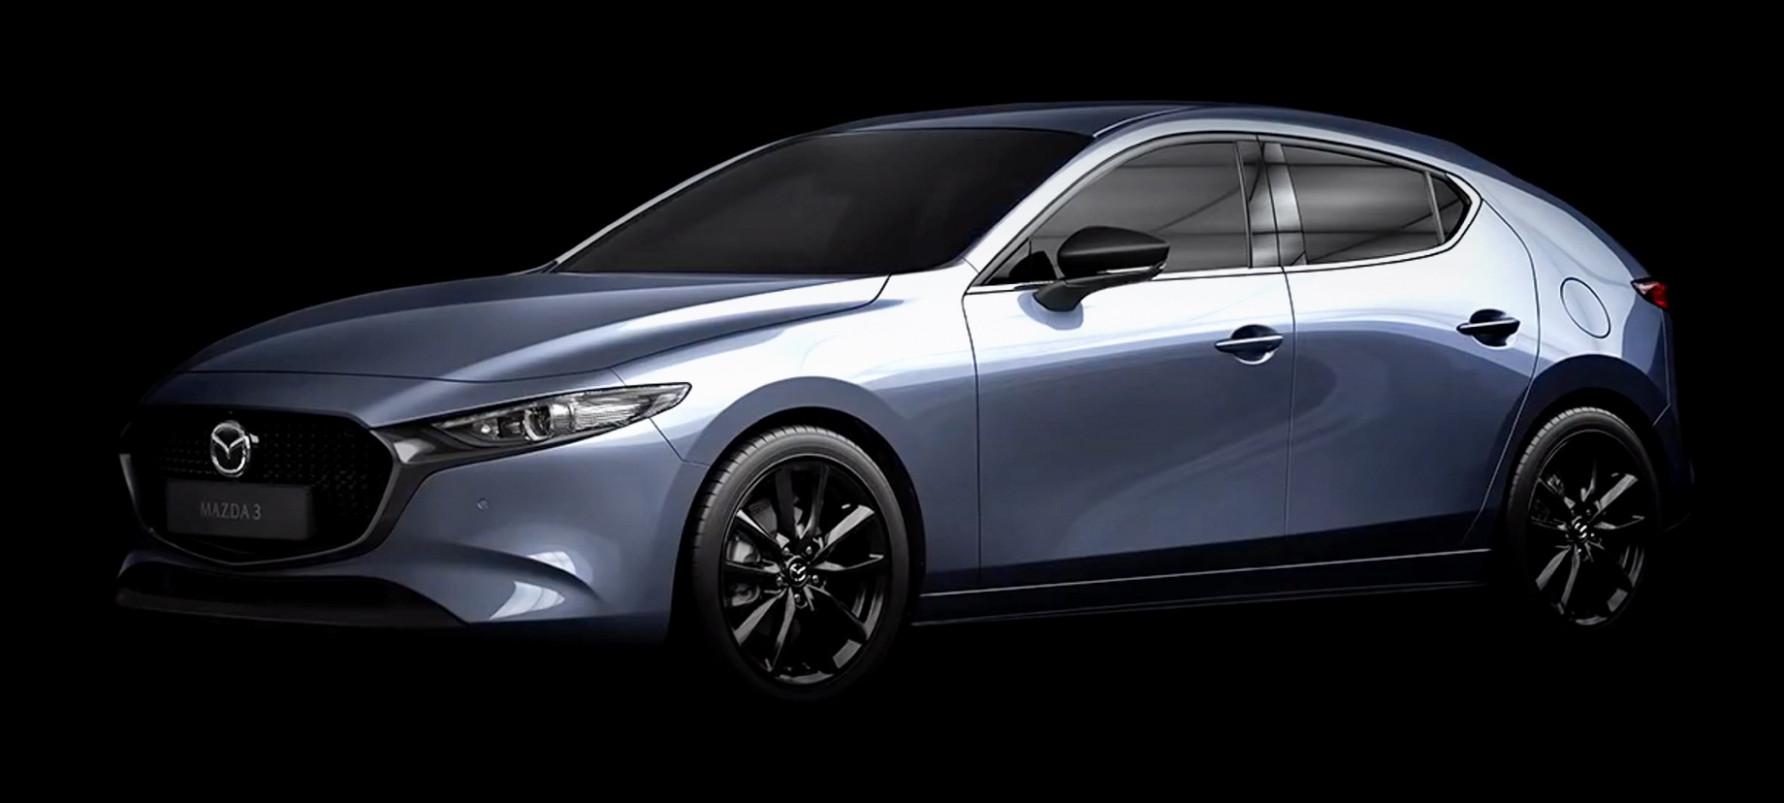 Wallpaper 2022 Mazda 3 Hatch